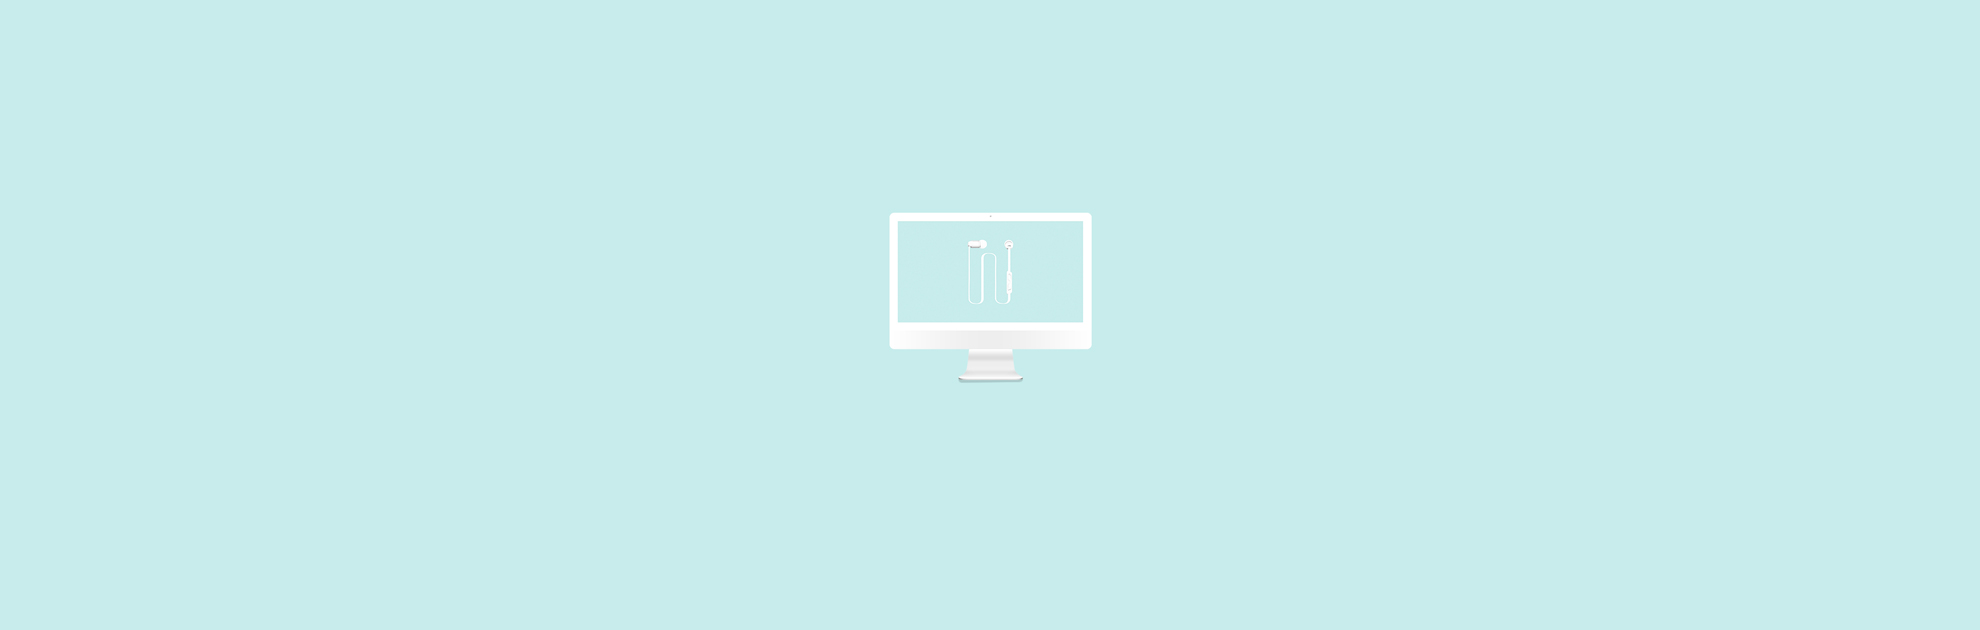 HYDE PARK MARKETPLACE   Art Direction, UI/UX Design